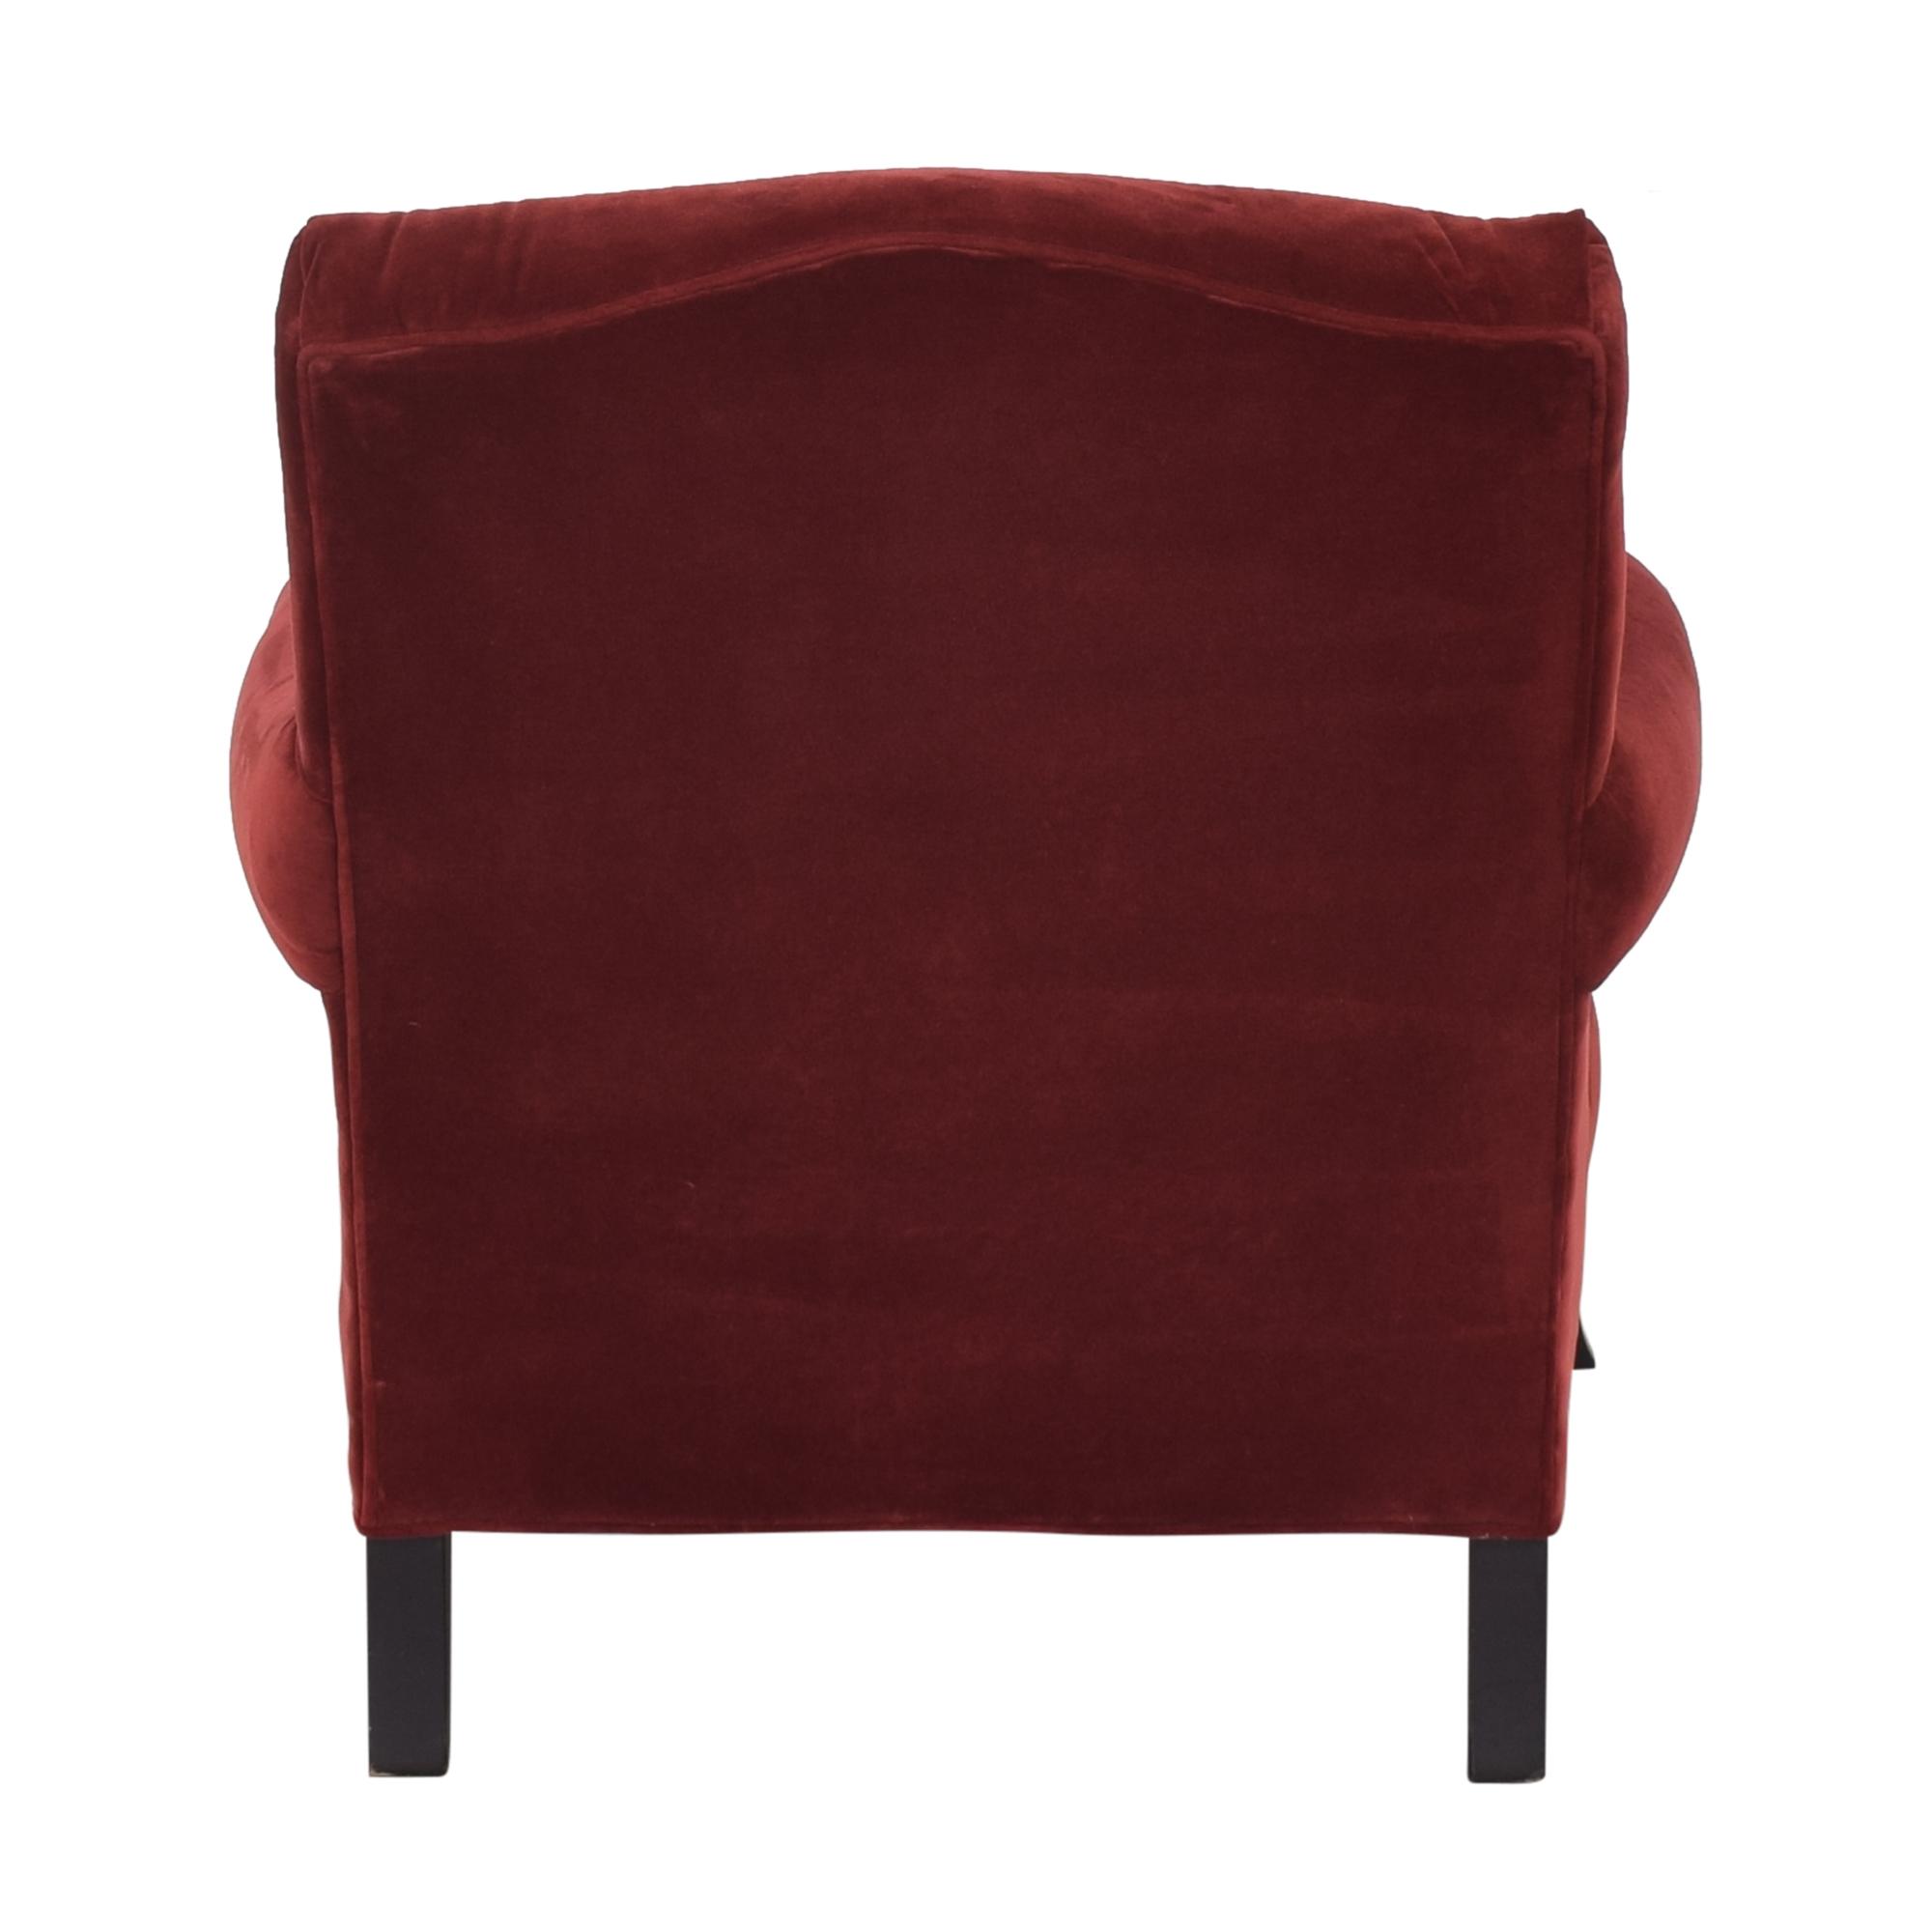 Crate & Barrel Crate & Barrel Chair price